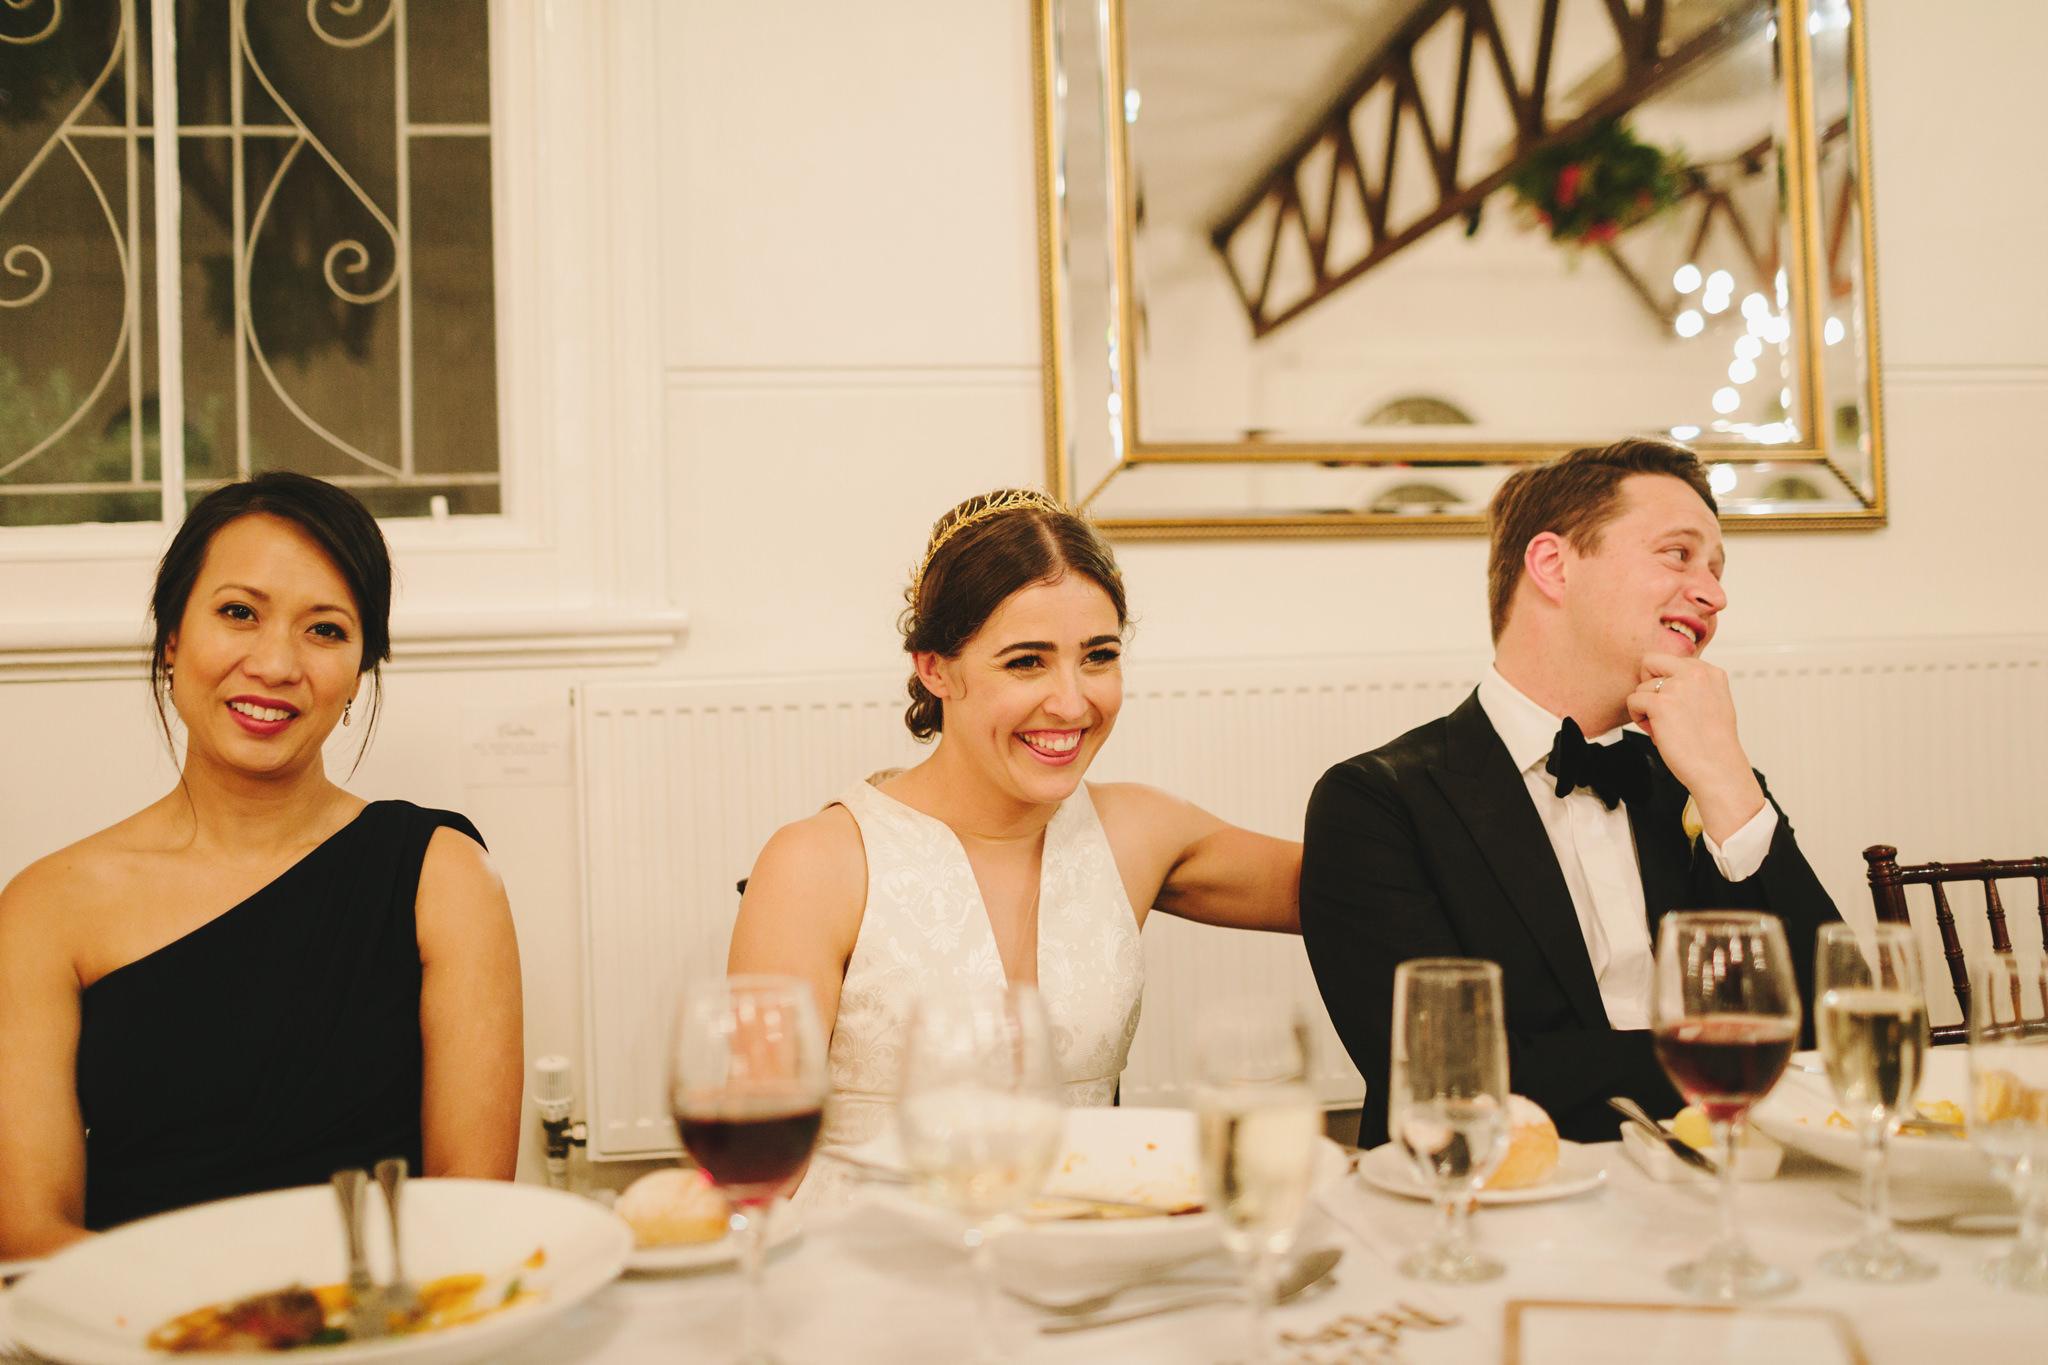 Abbotsford_Convent_Wedding_Peter_Anna122.JPG